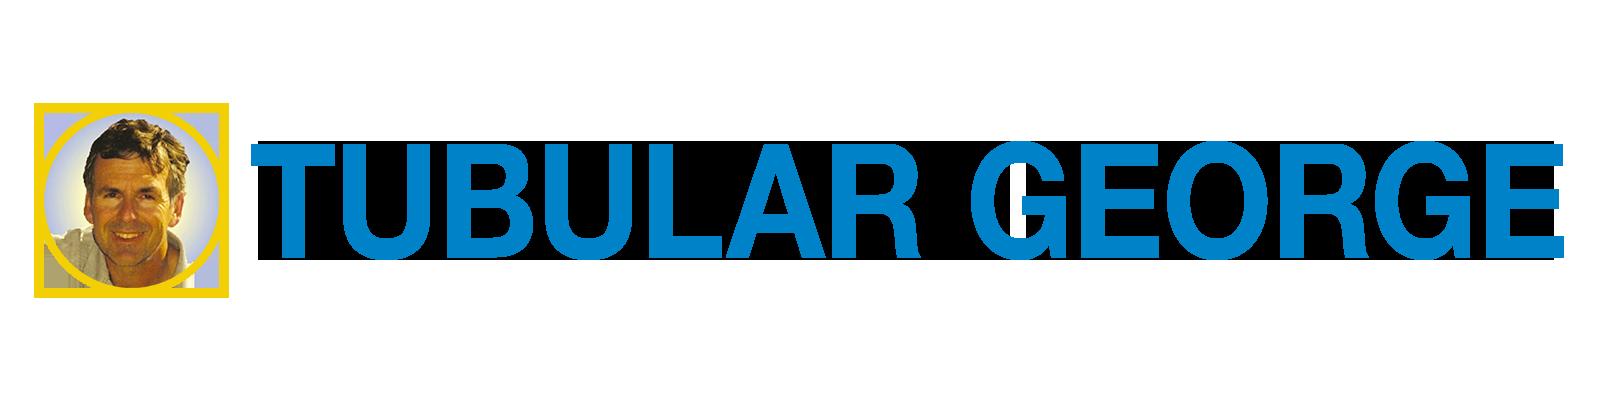 Tubular-George-of-Santa-Barbara-logo